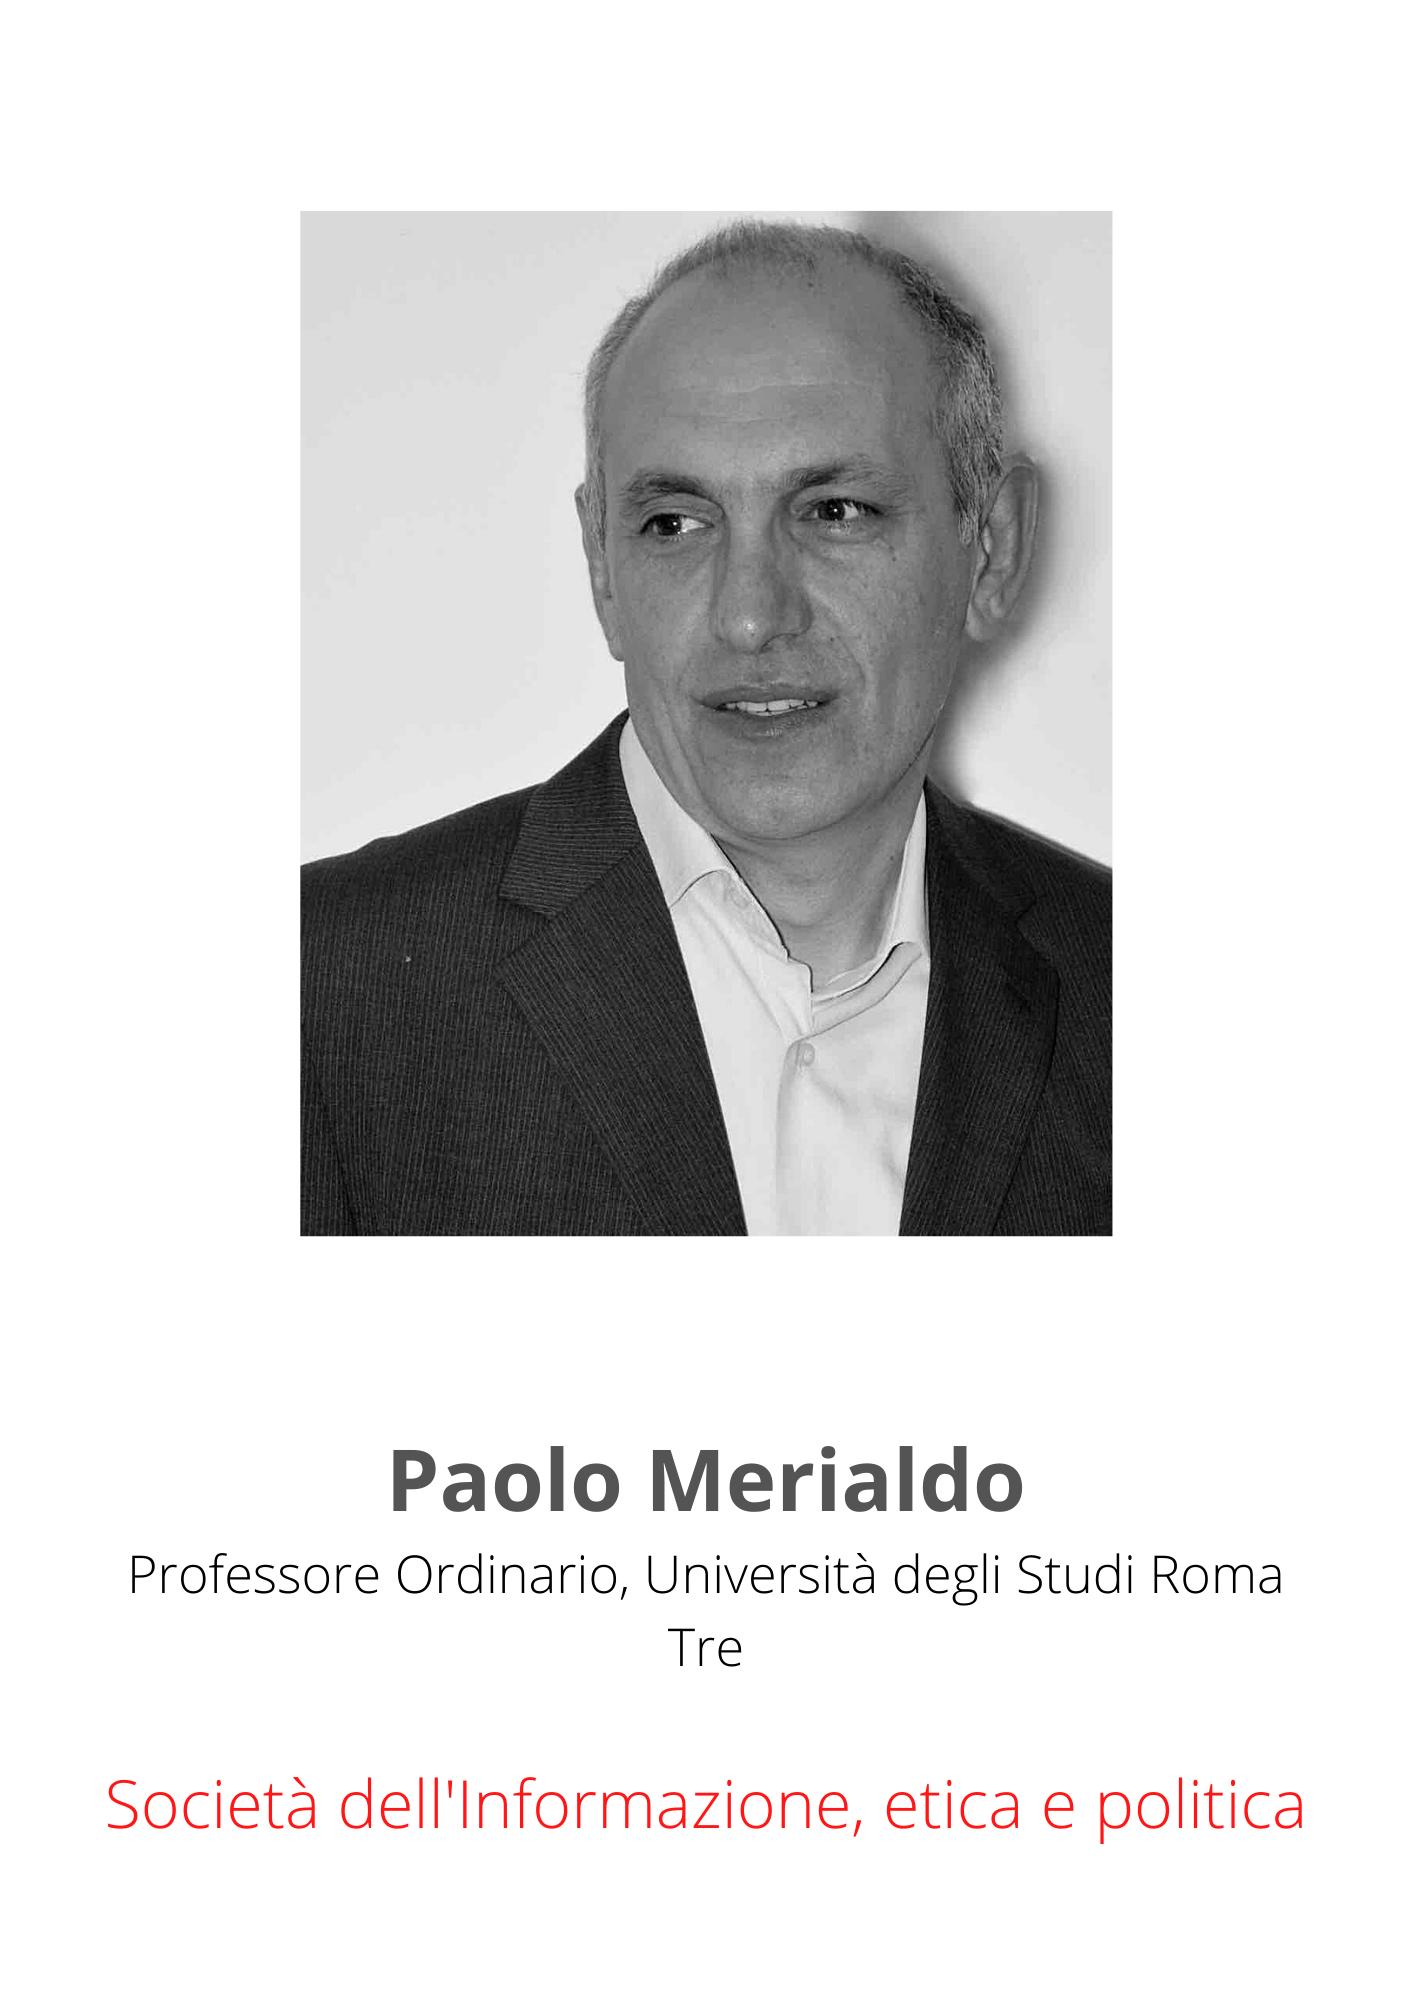 Paolo Merialdo